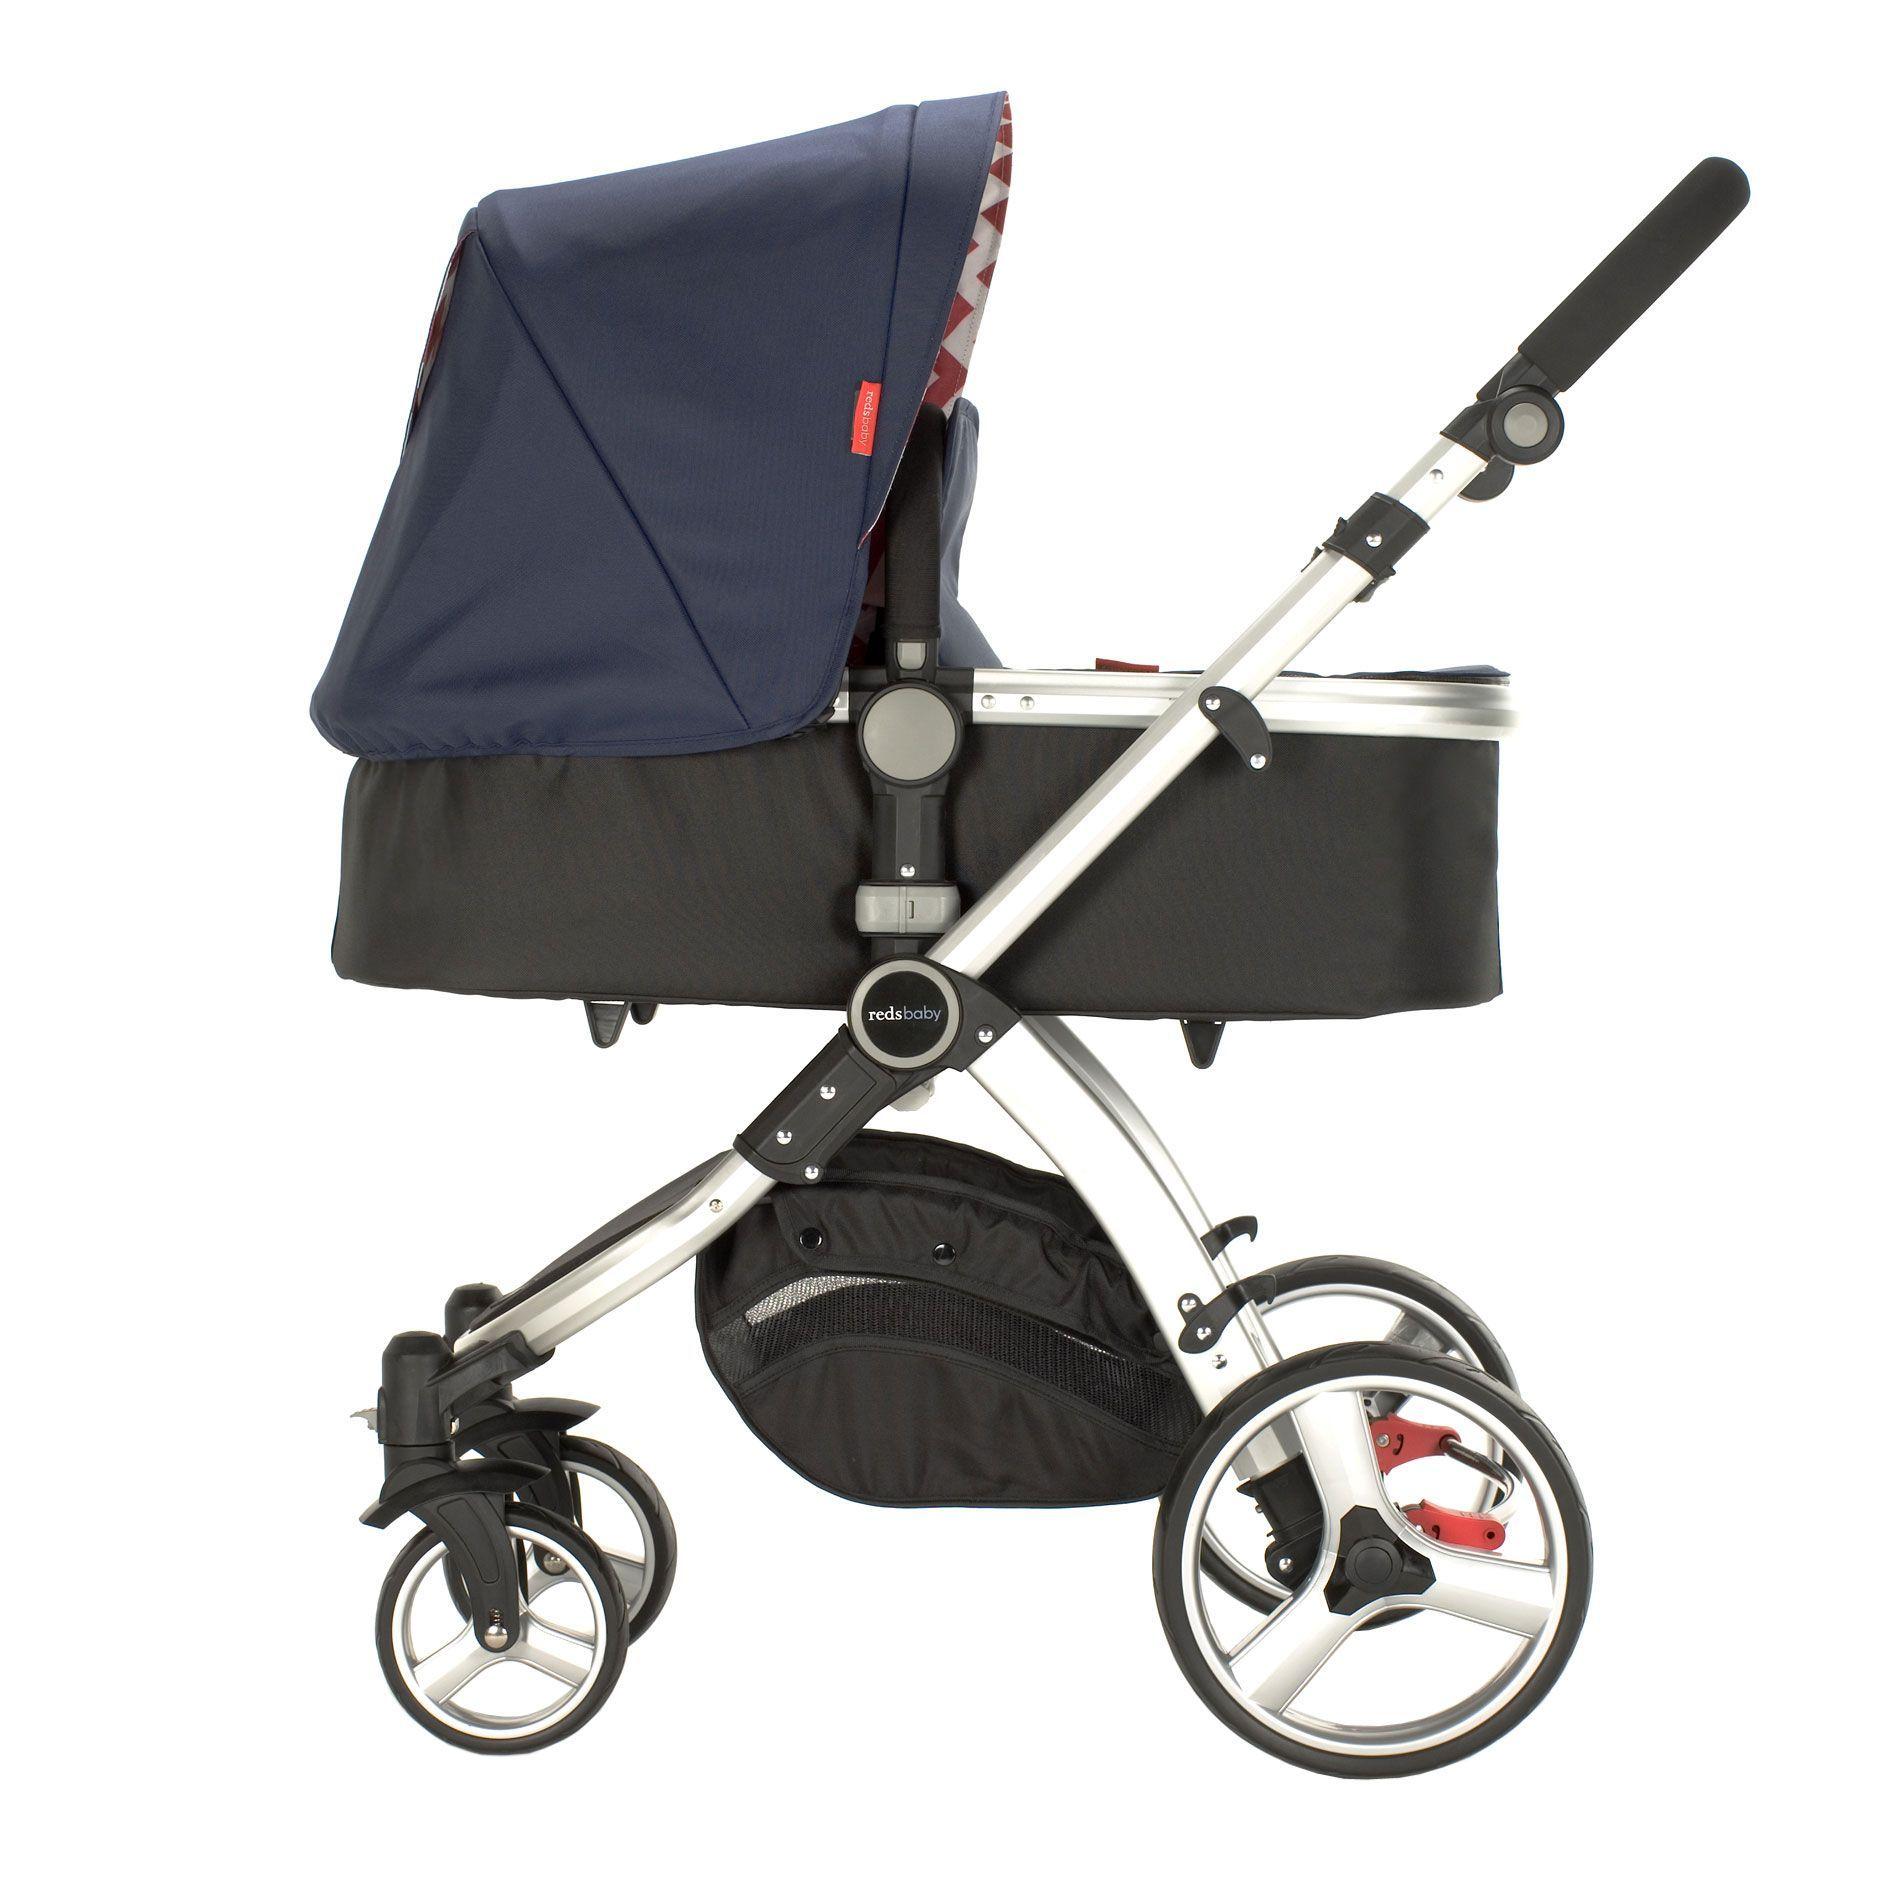 Best stroller I've ever owned. Super light and easy to